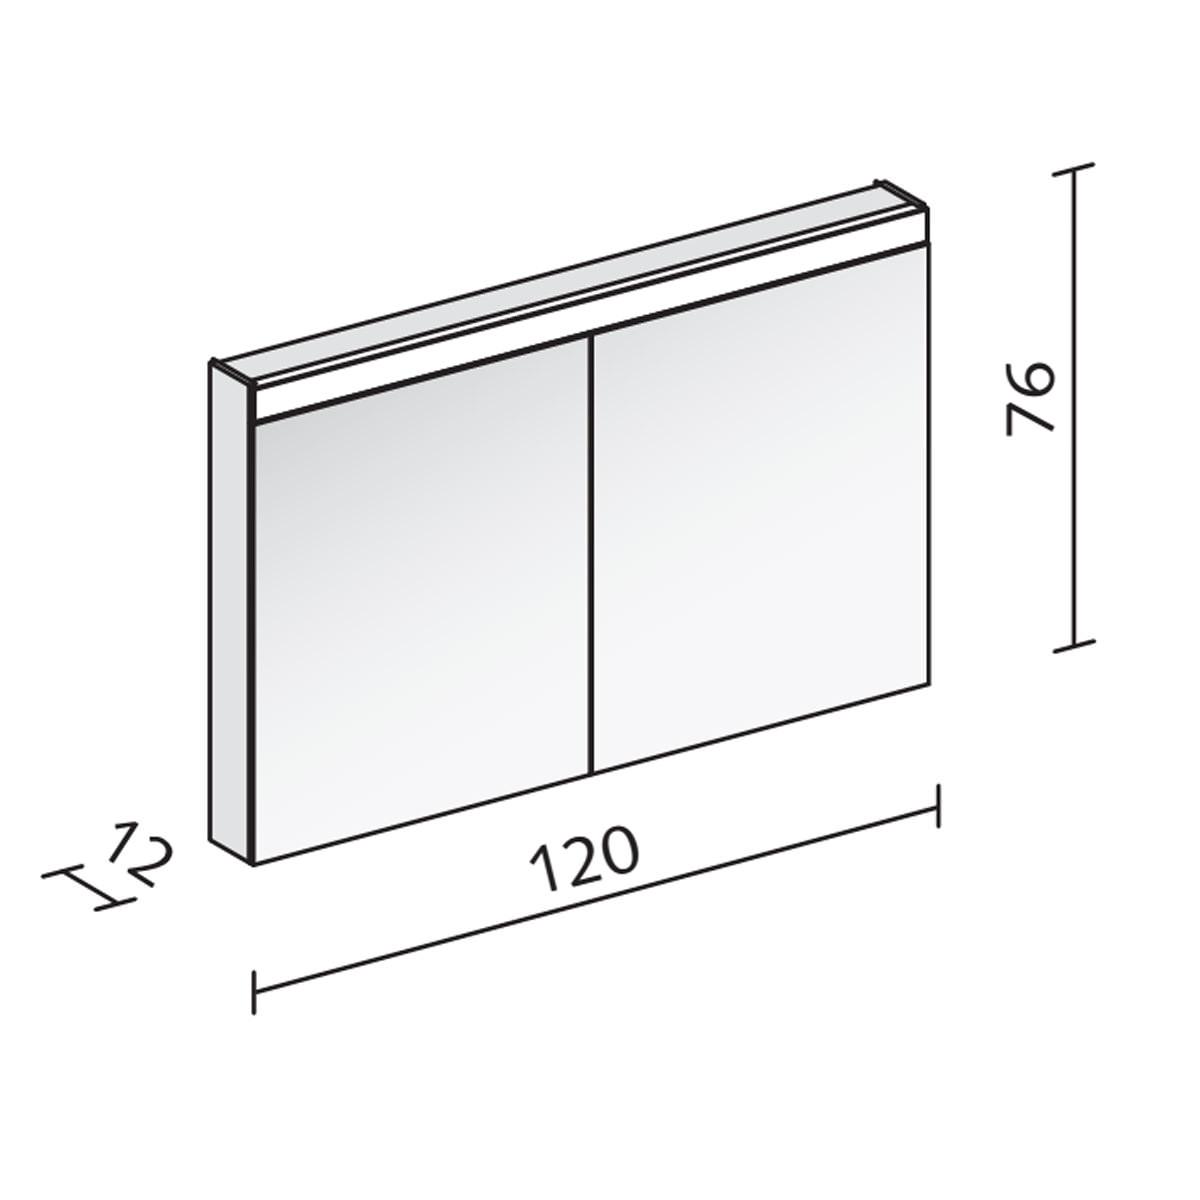 Schneider pataline 2 door led mirror cabinet 1200mm for Bathroom cabinets 1200mm wide